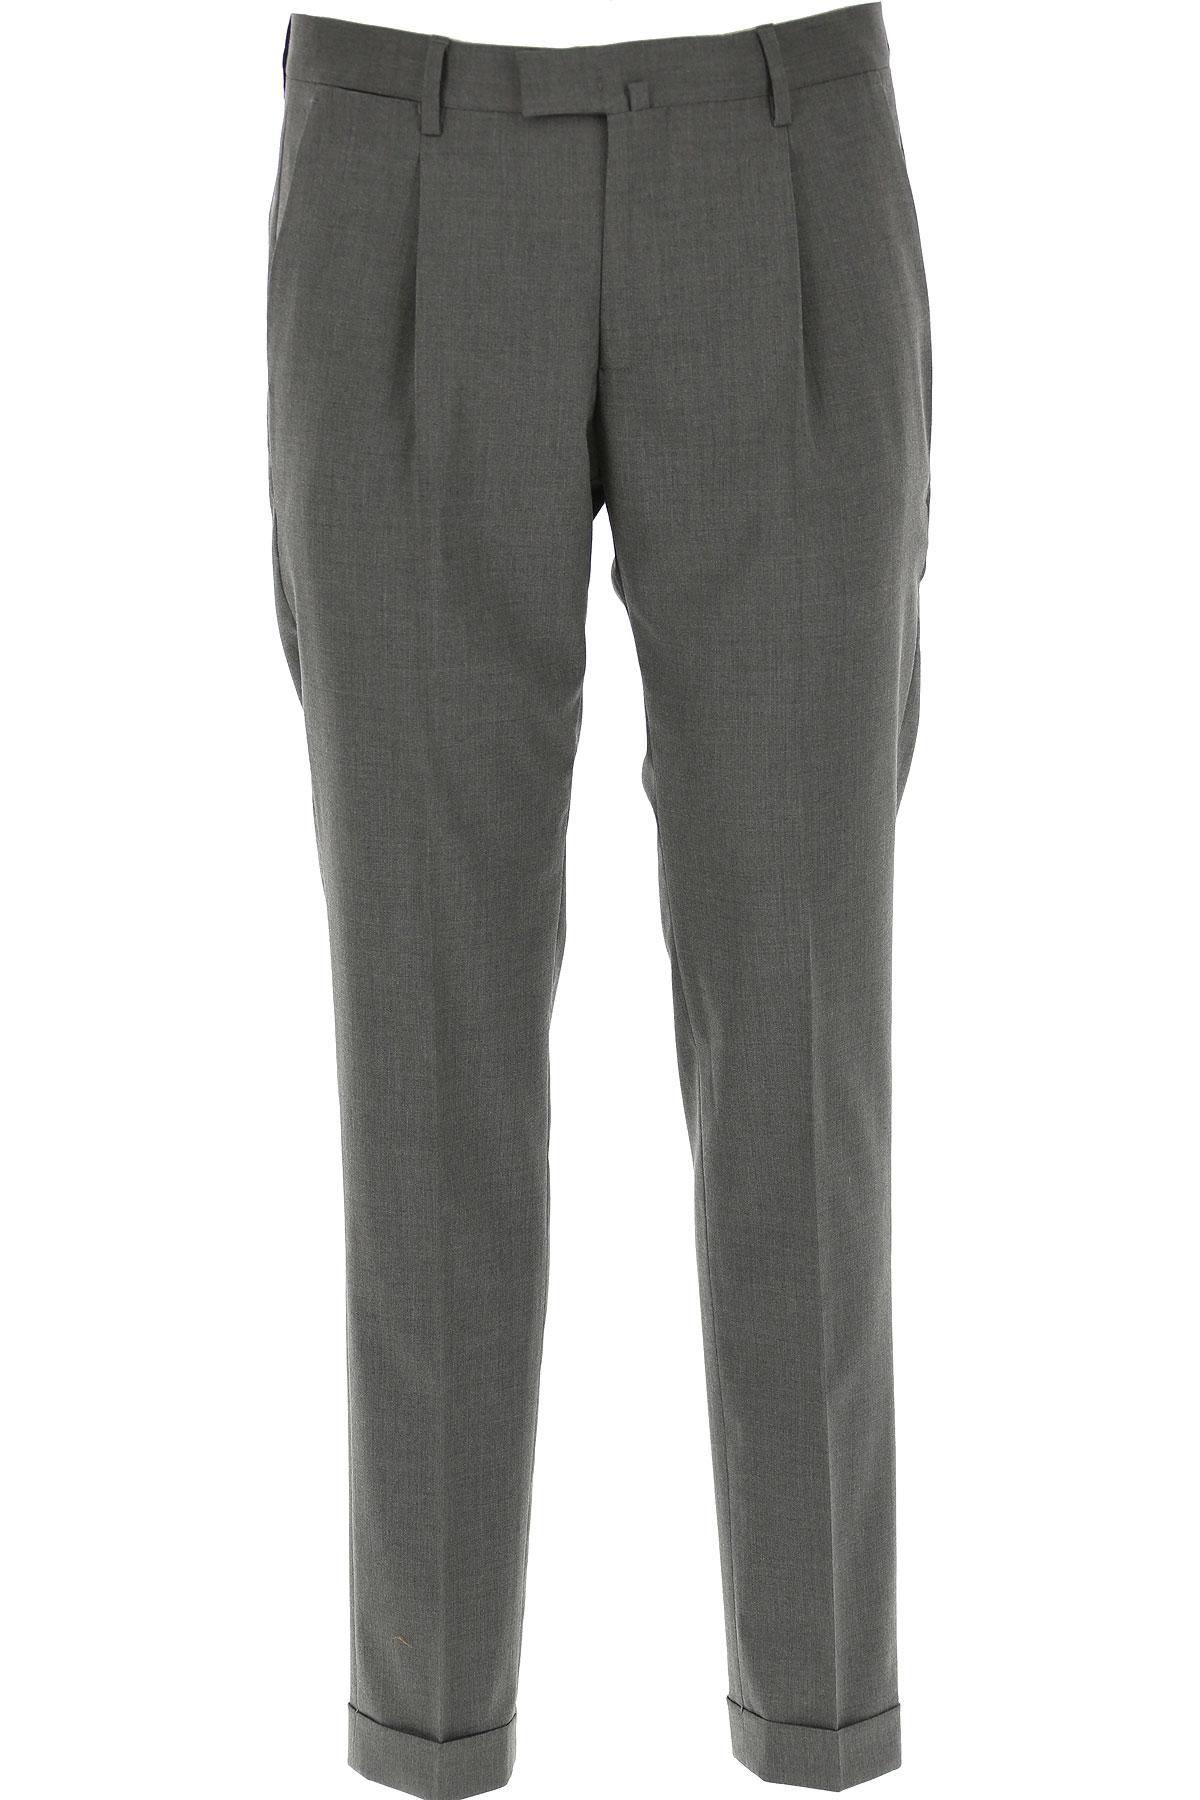 Briglia Pants for Men On Sale, Grey, Wool, 2019, 32 34 36